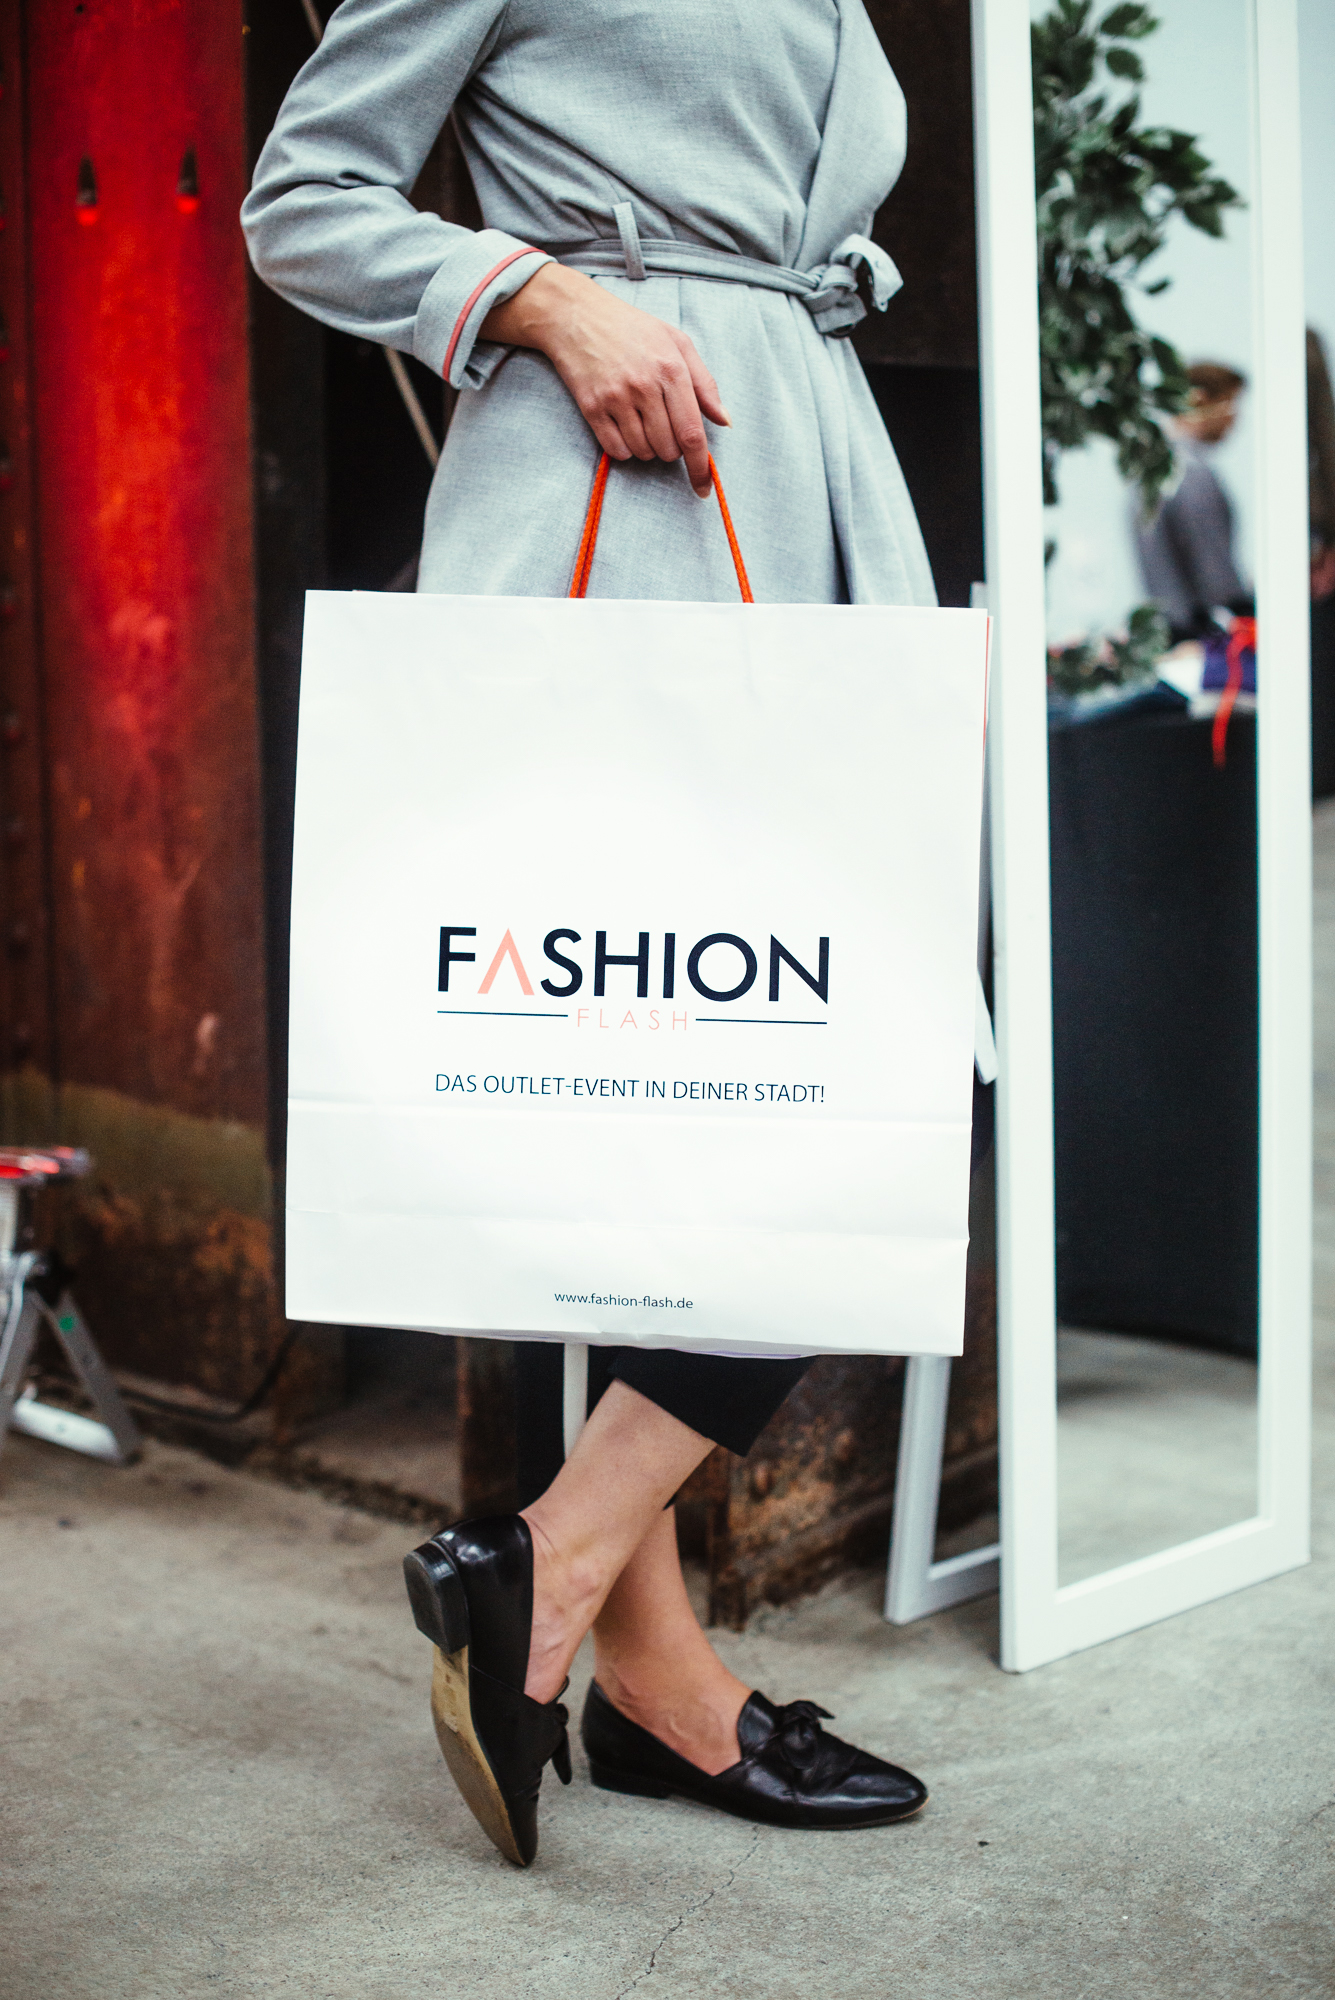 Fashion Flash Erfahrung_Göttingen_Lokhalle_Modeblog-Makren_Preise_Final 5